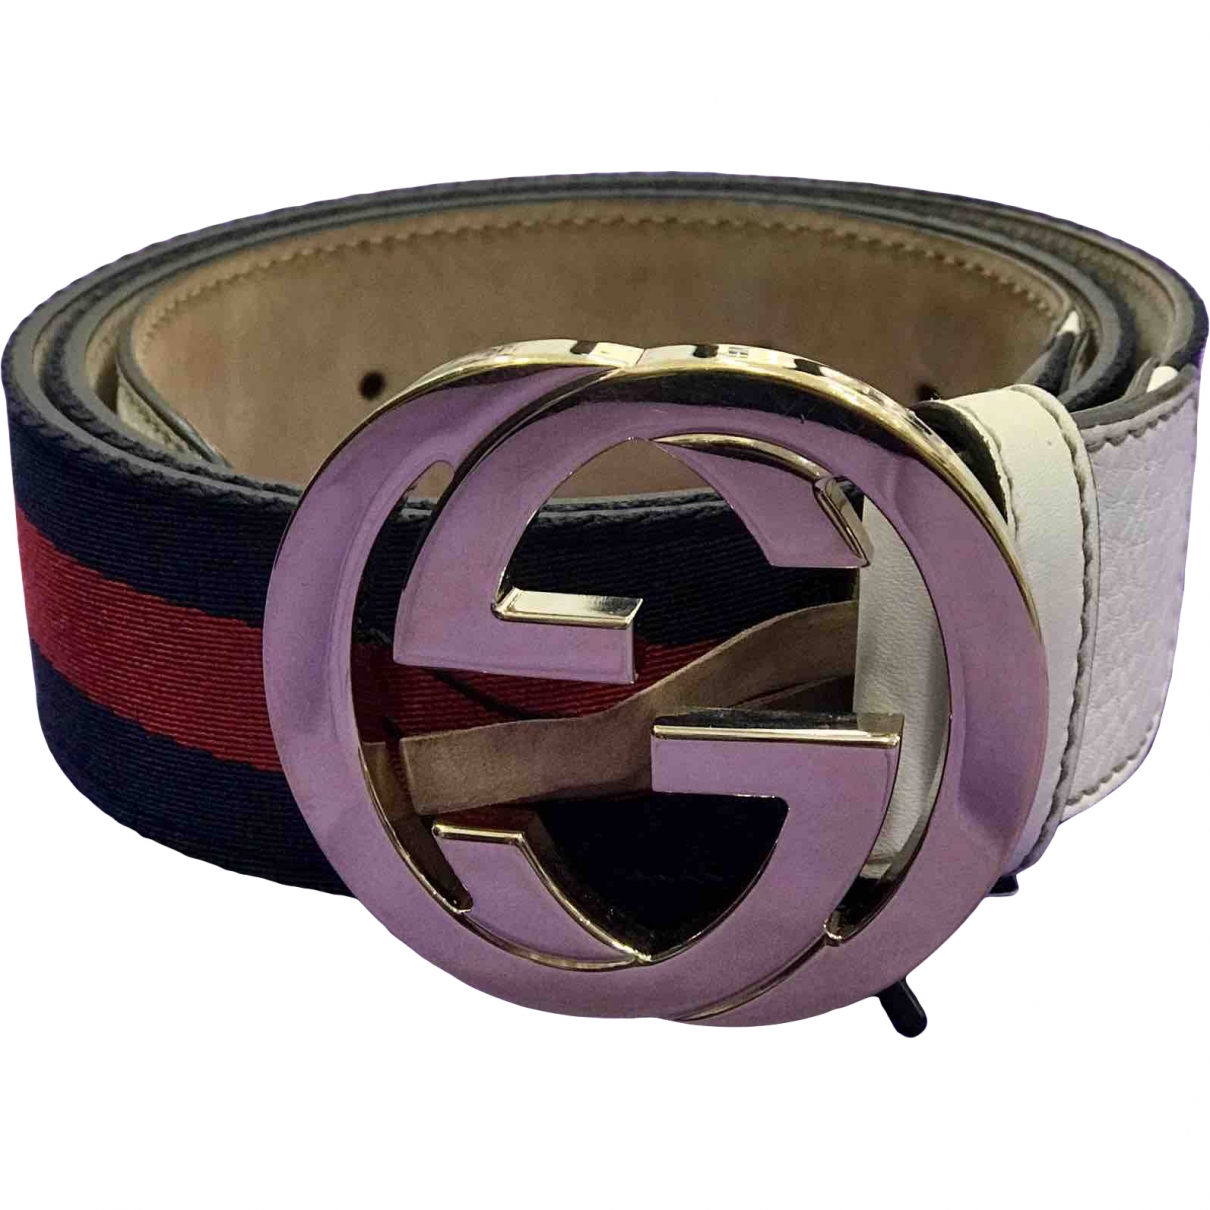 Gucci Interlocking Buckle Multicolour Cloth belt for Women 90 cm